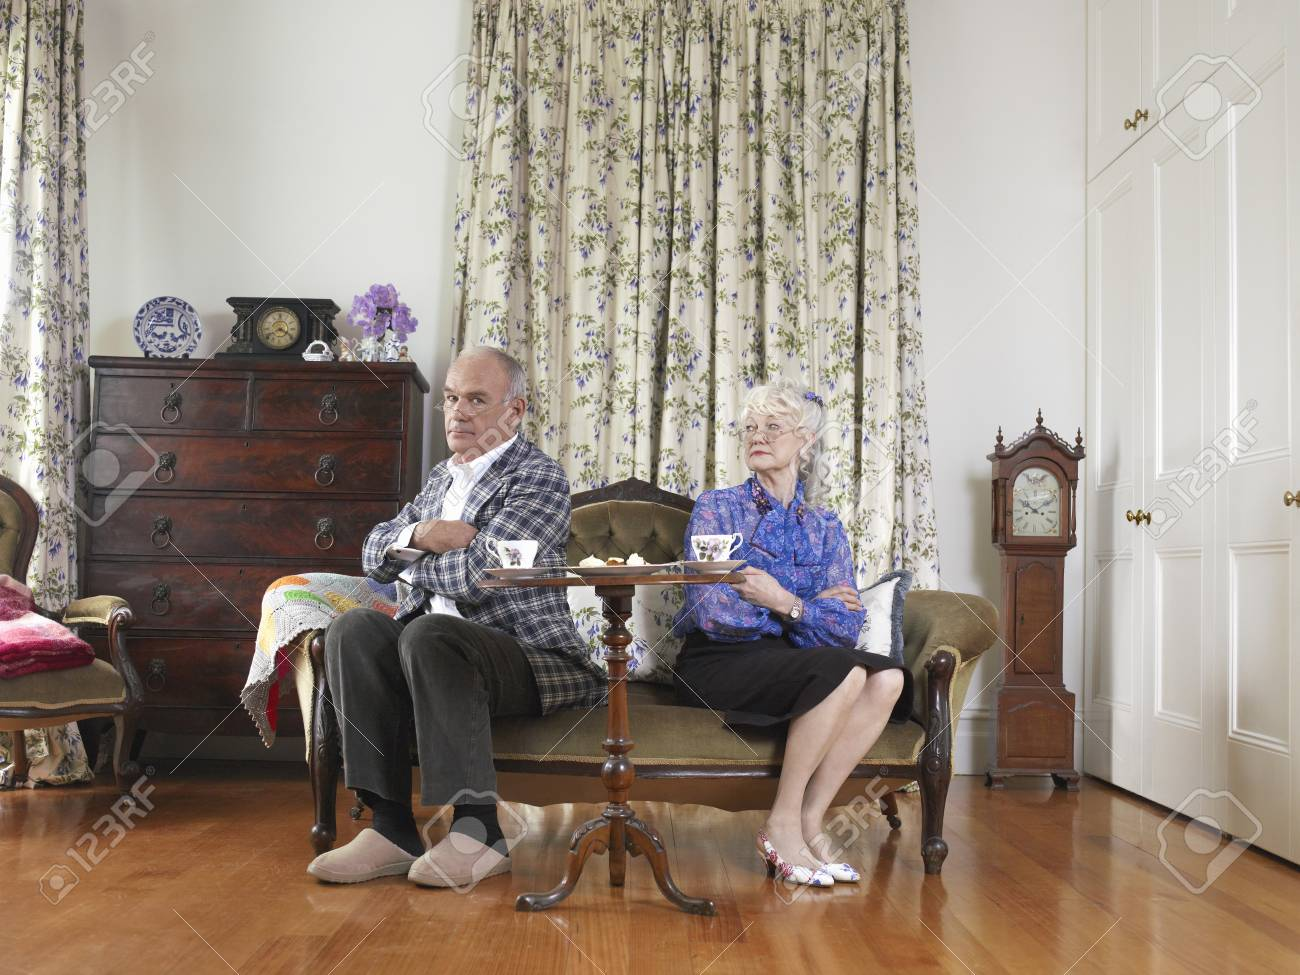 Senior Couple Having a Spat Stock Photo - 5436084